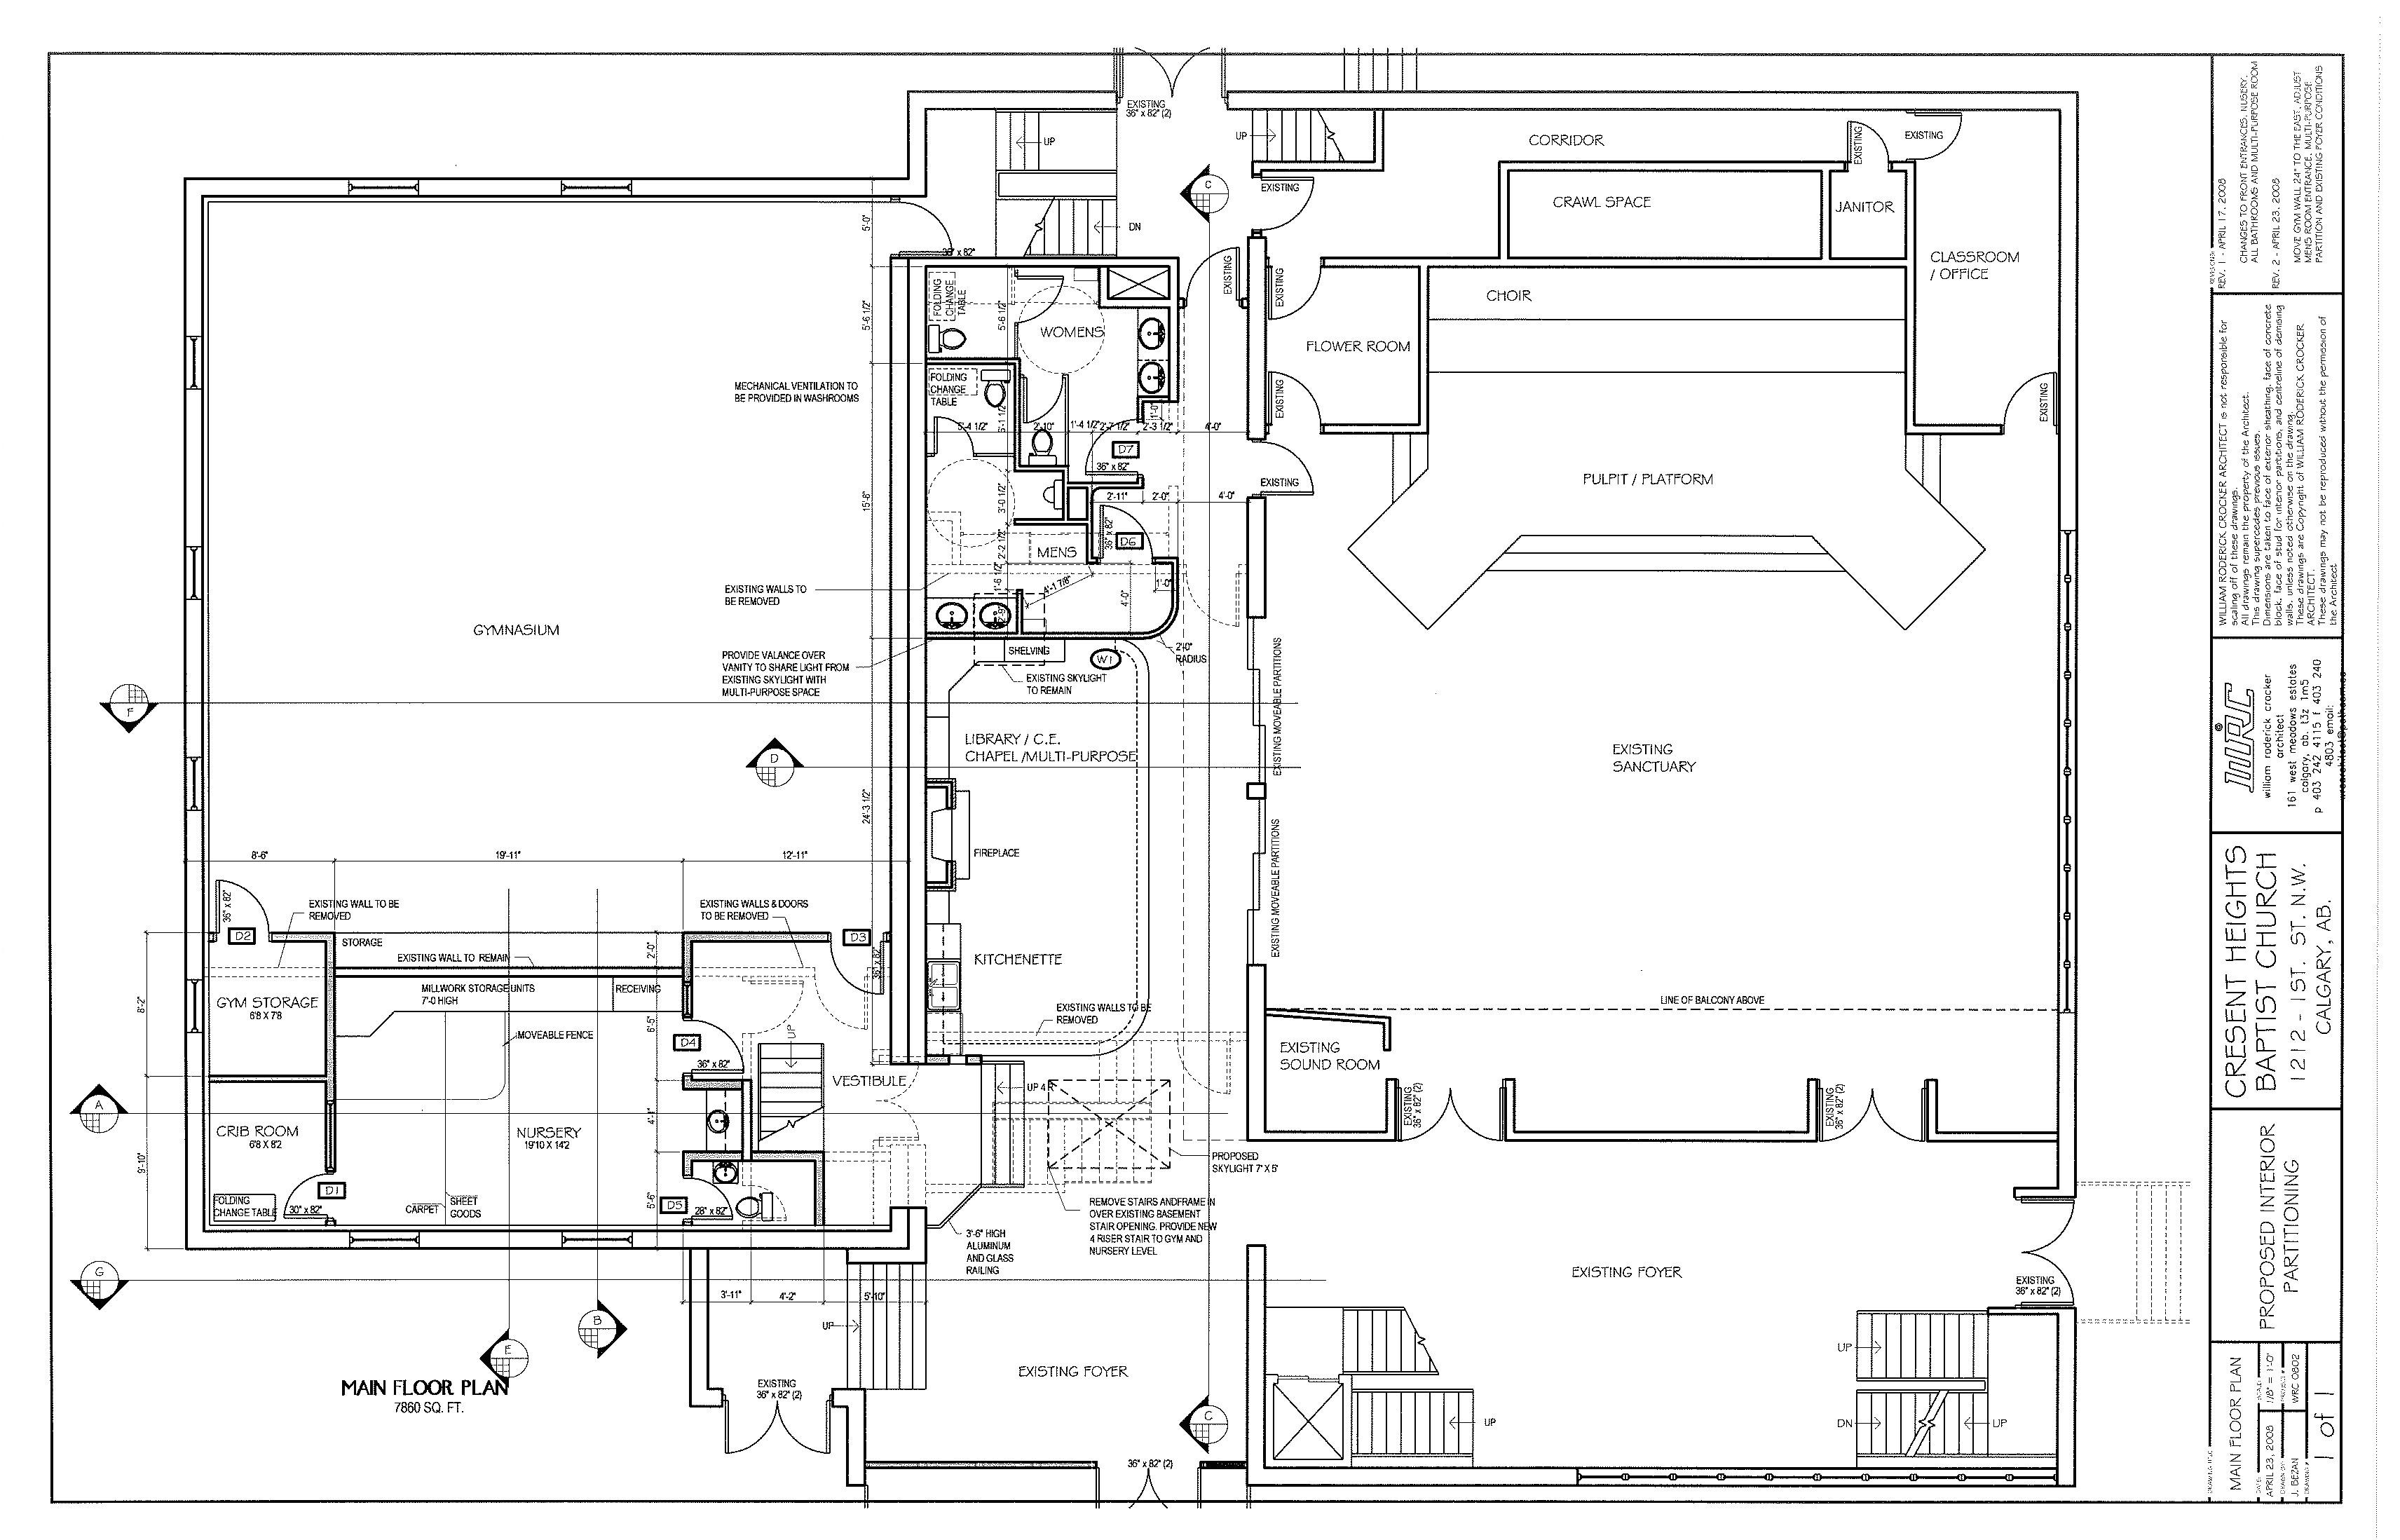 Home Plan Drawing Pdf Rod Crocker Institutional